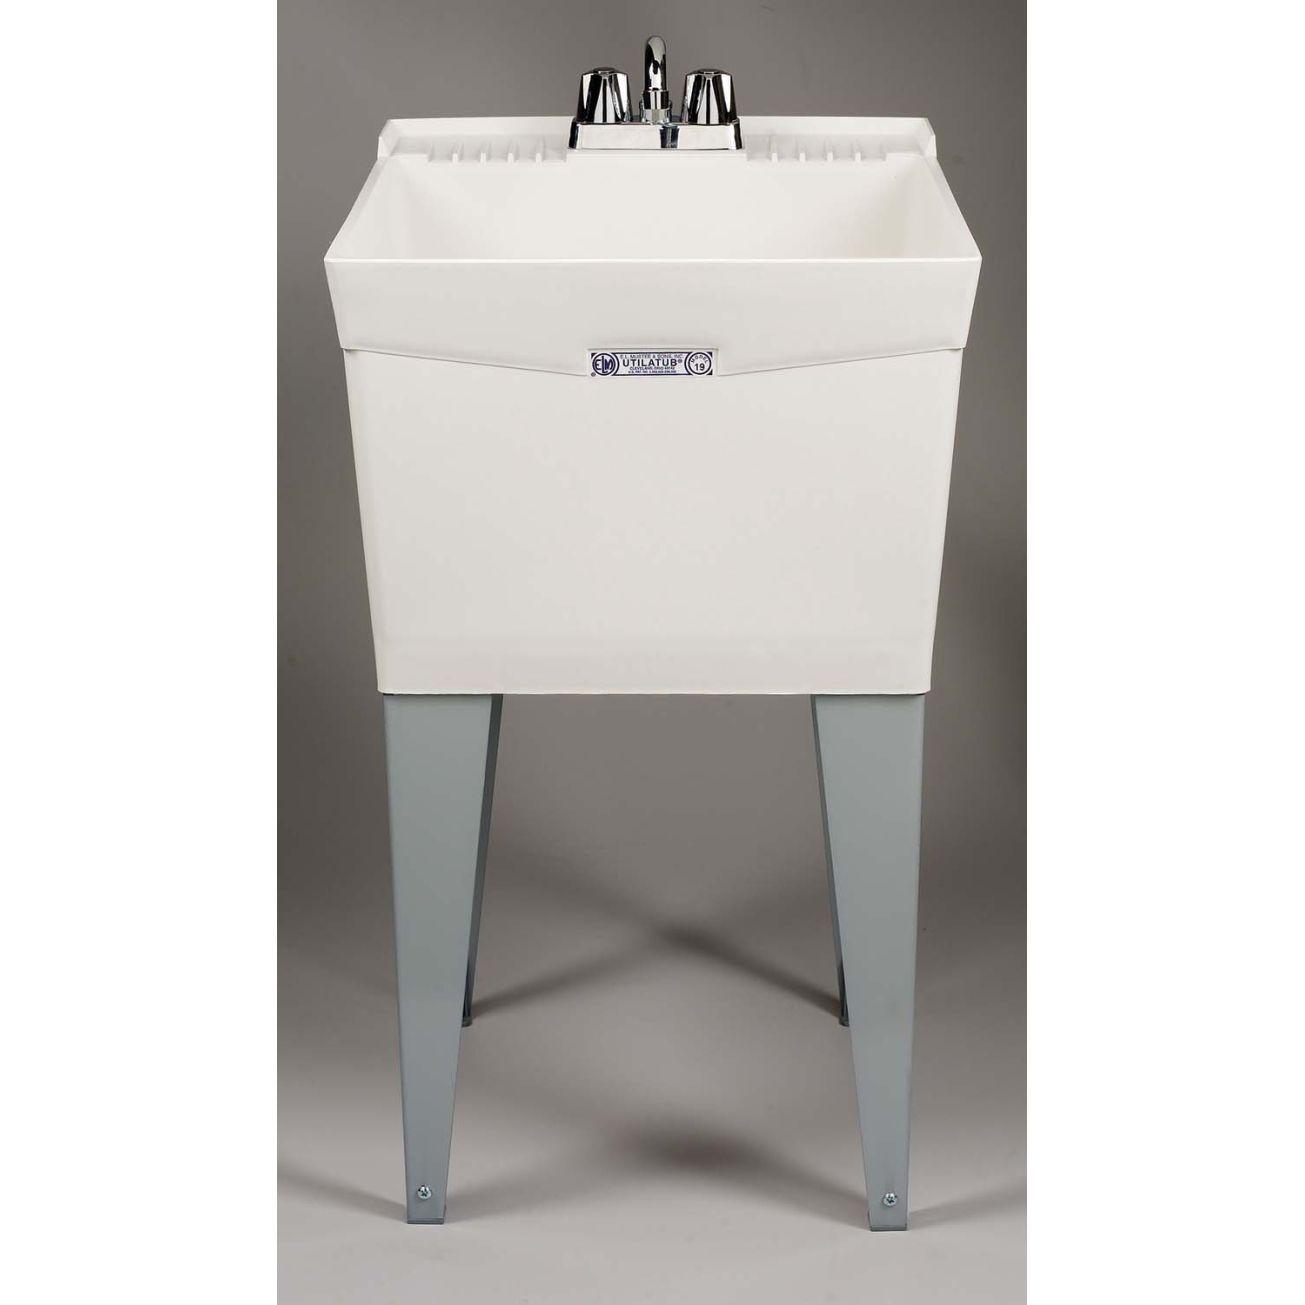 Molded Single Laundry Tub 19f Laundry Tubs Ace Hardware Laundry Tubs Utility Sink Sink